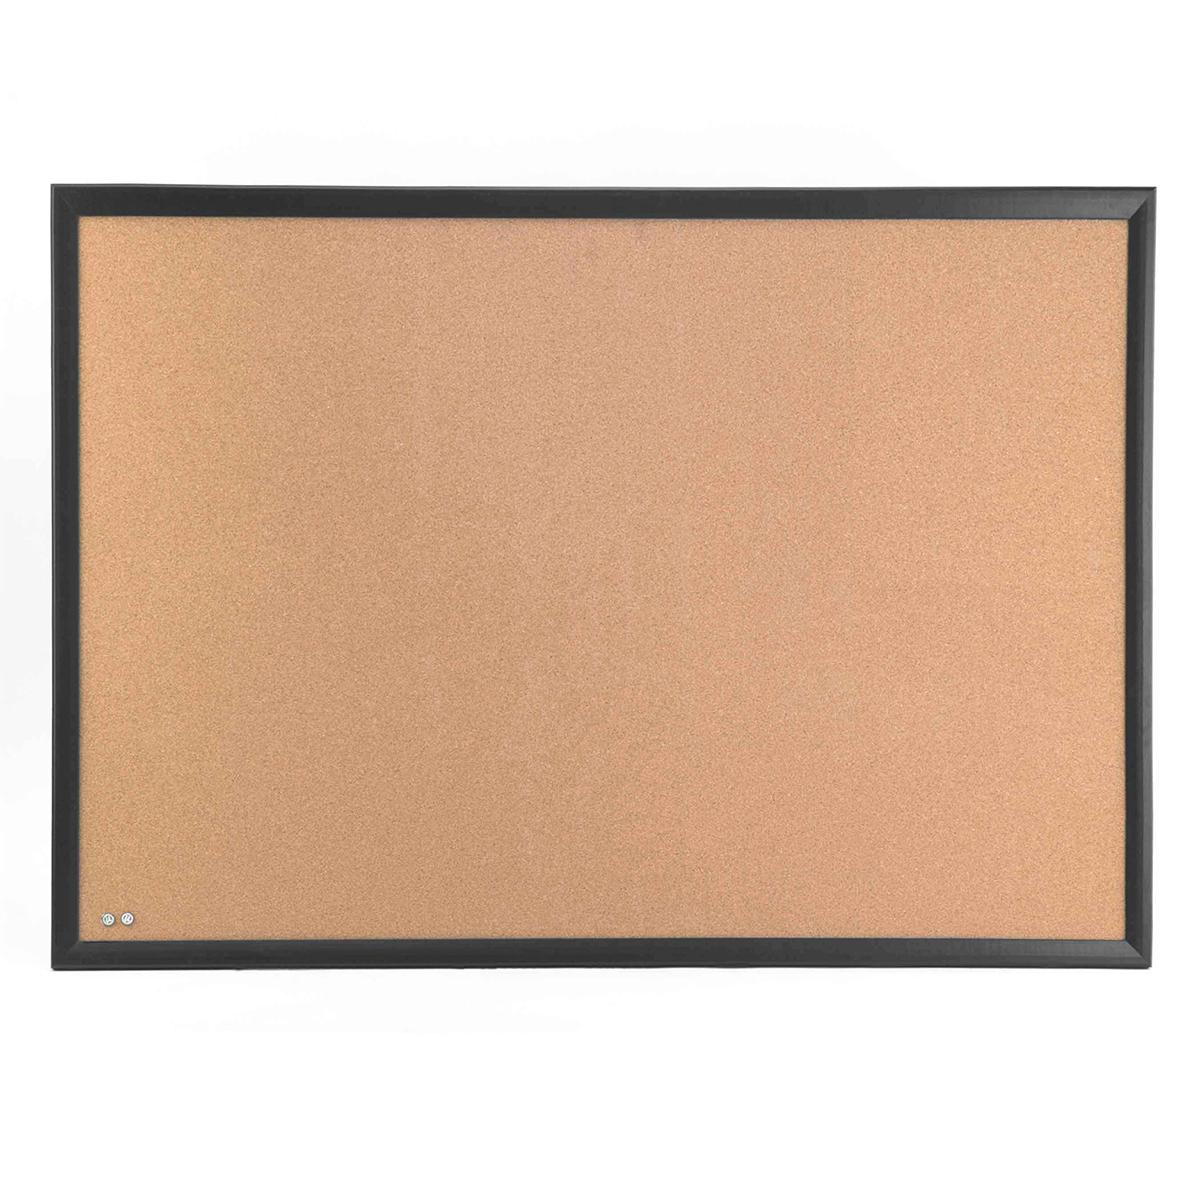 Cork Board w/ Black Frame